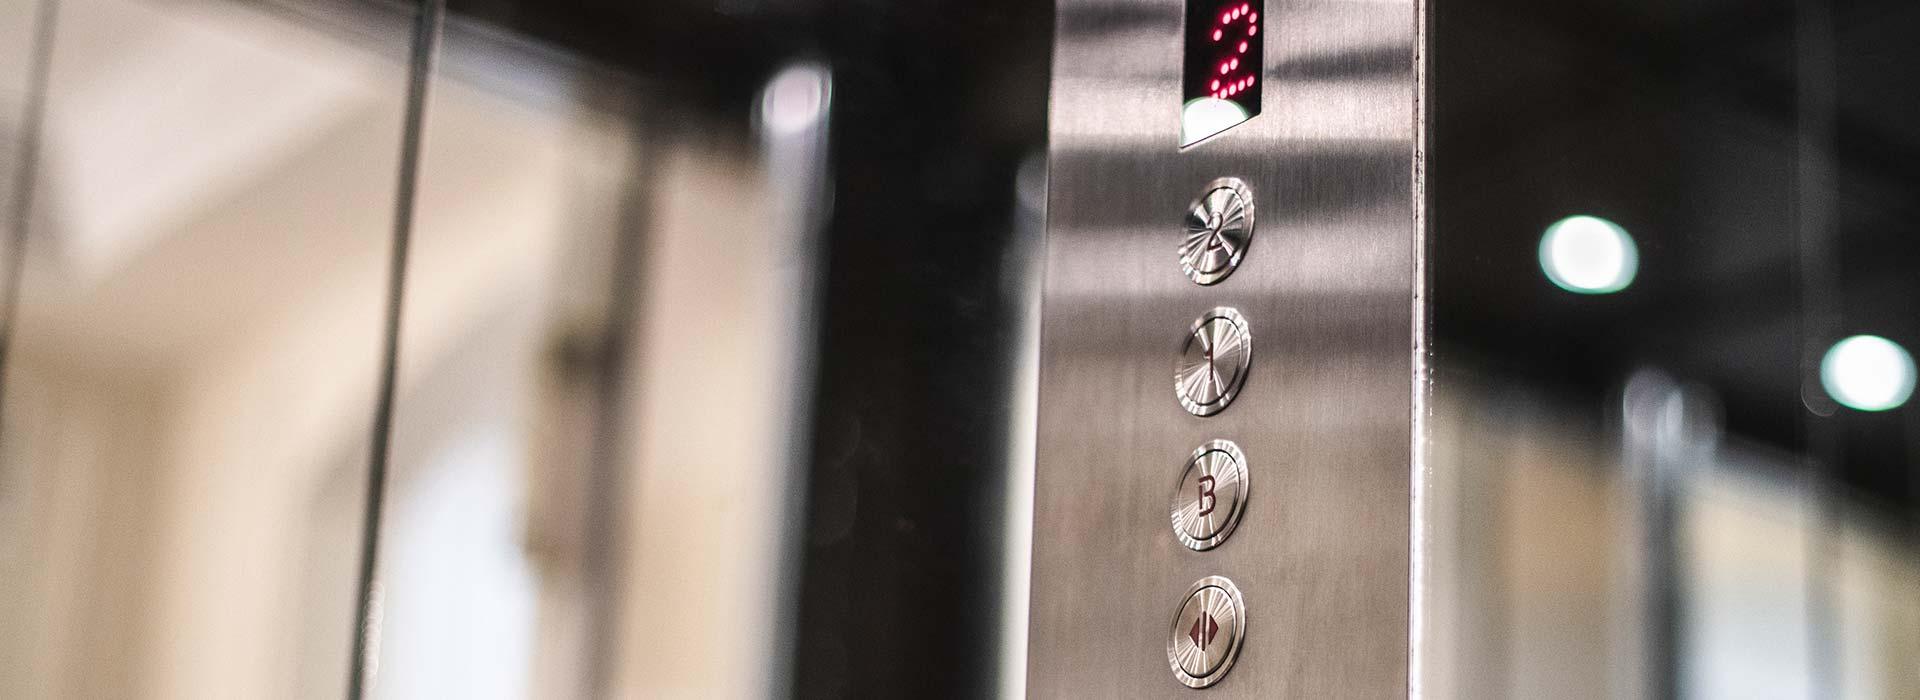 Elevator companies in North America include Federal Elevator